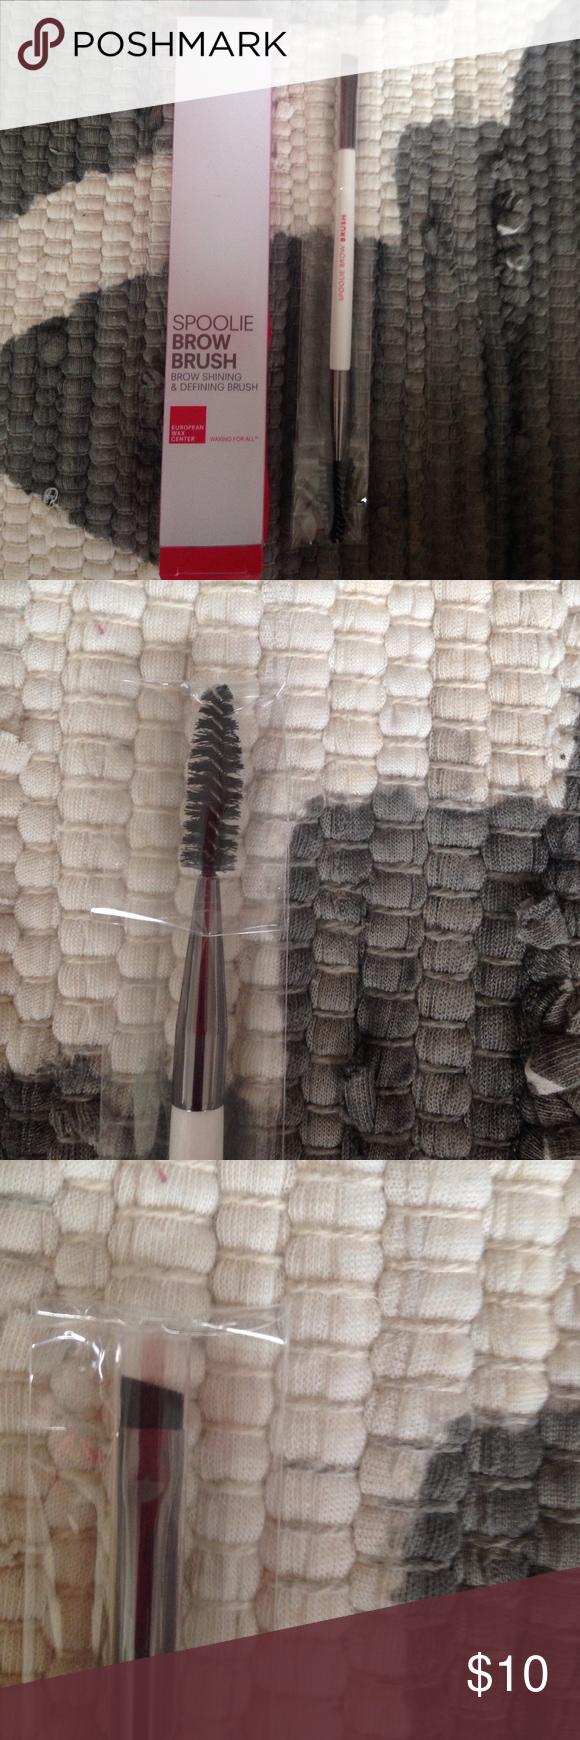 European Wax Center Spoolie Brow Brush | Brow brush, Wax ...